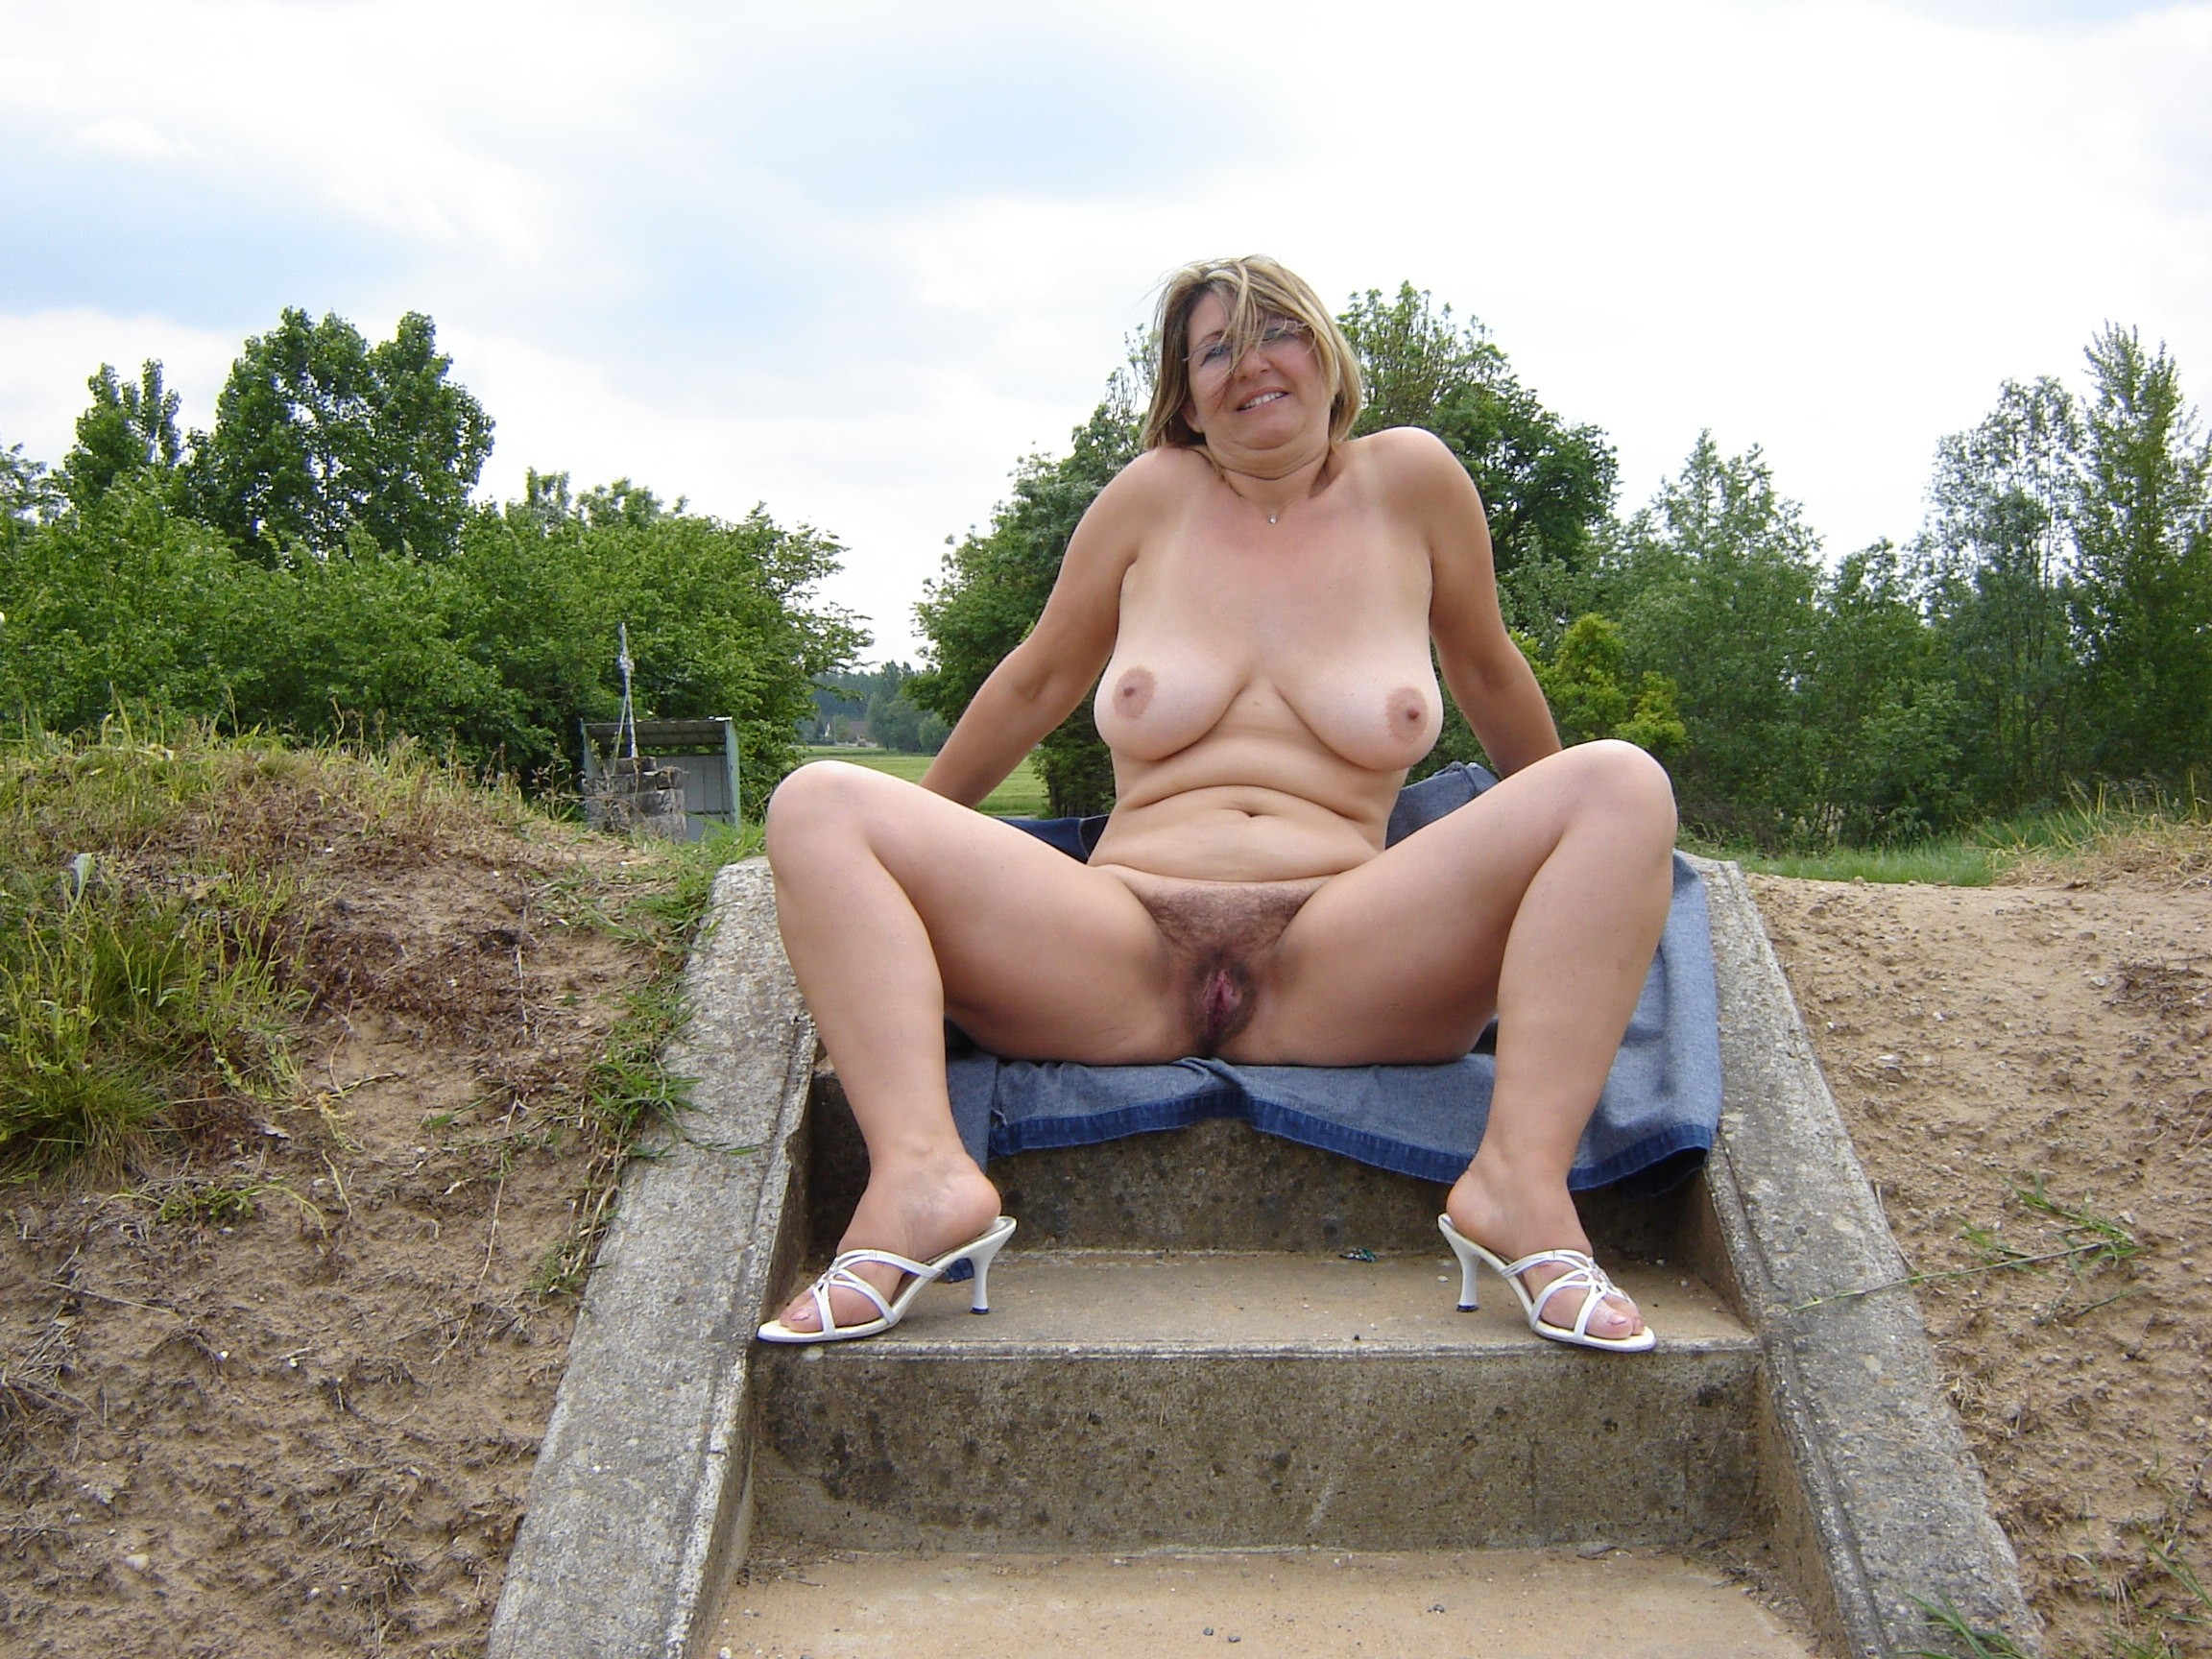 femme nue ronde escort la rochelle